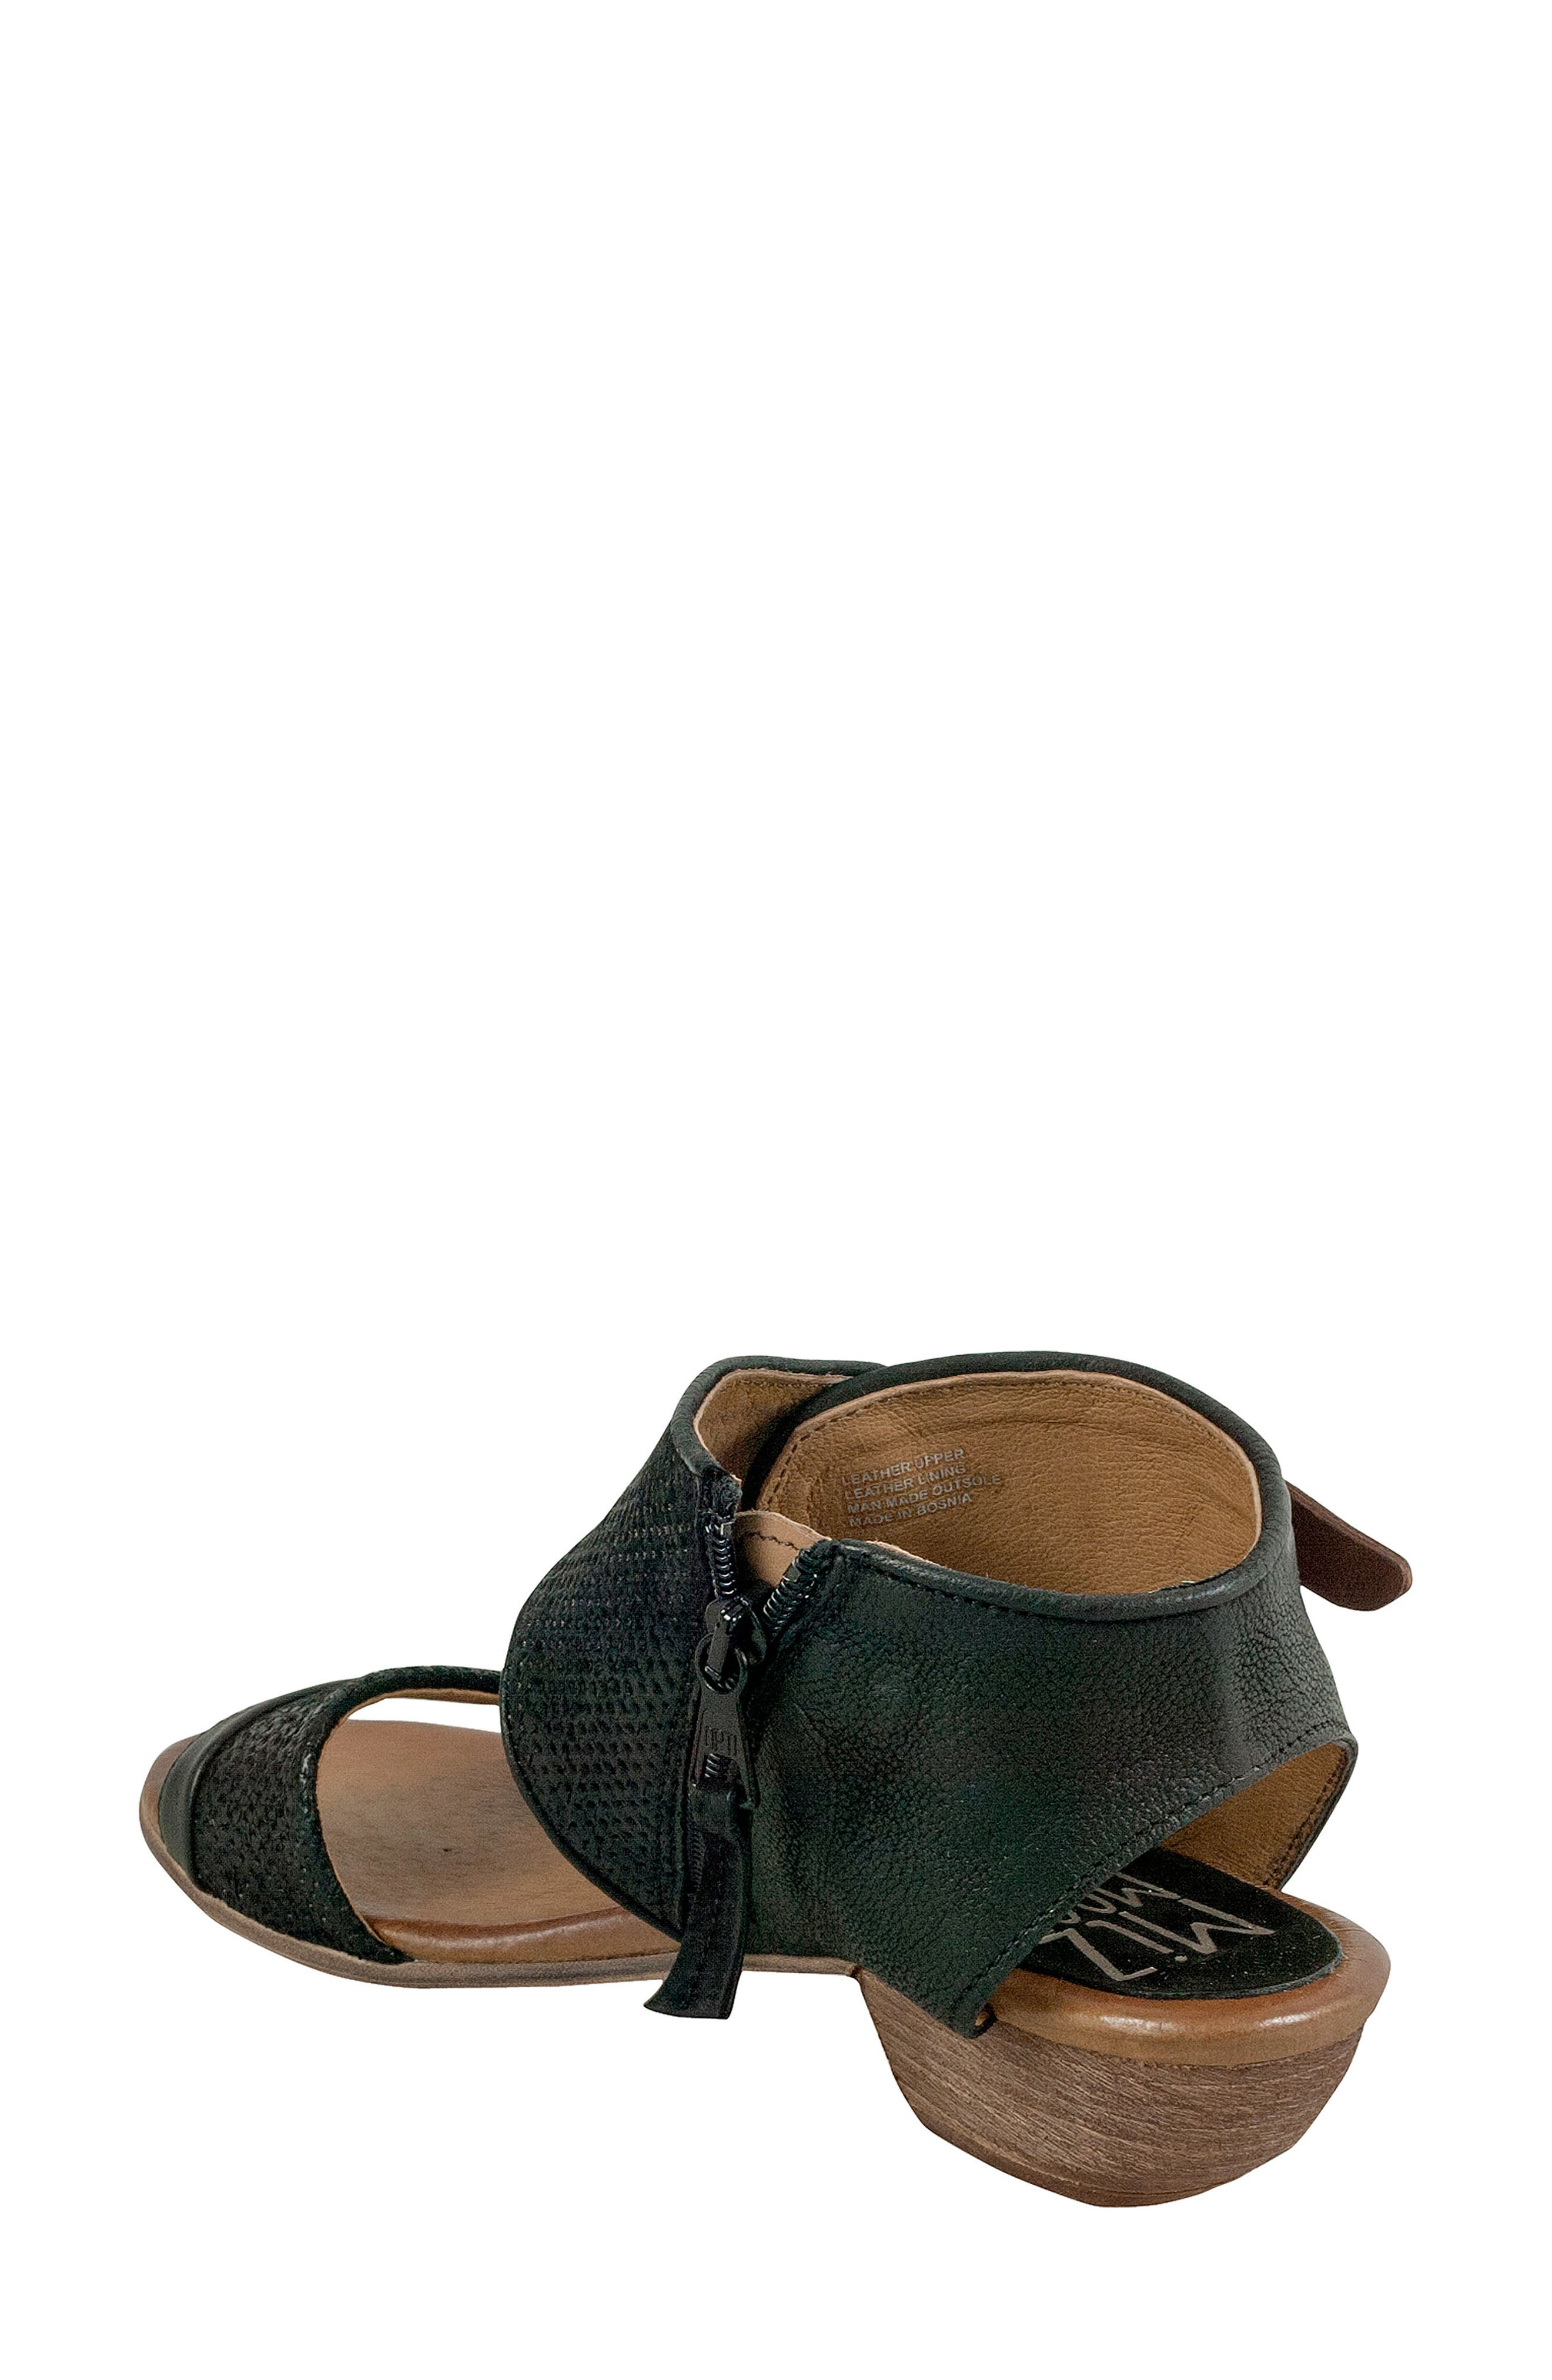 Chatham Textured Sandal,                             Alternate thumbnail 2, color,                             001